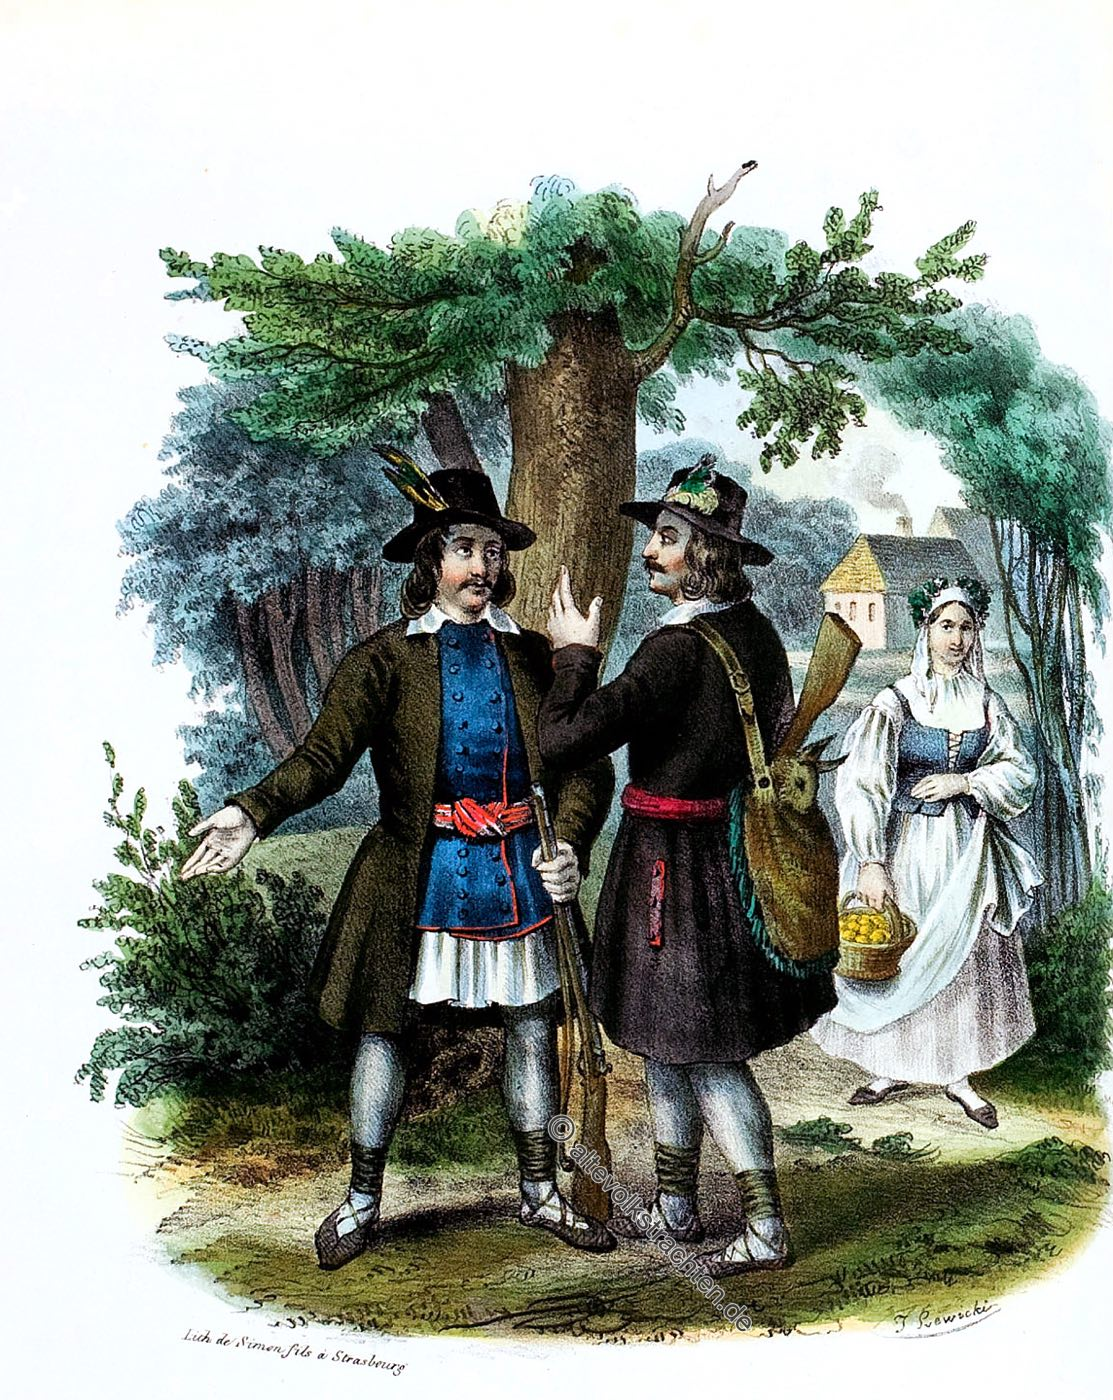 Trachten, Polen, Kurpie, Ostrolenka, Ostrołęka, Kurpengau, Kurpie, Scharfenwiese,